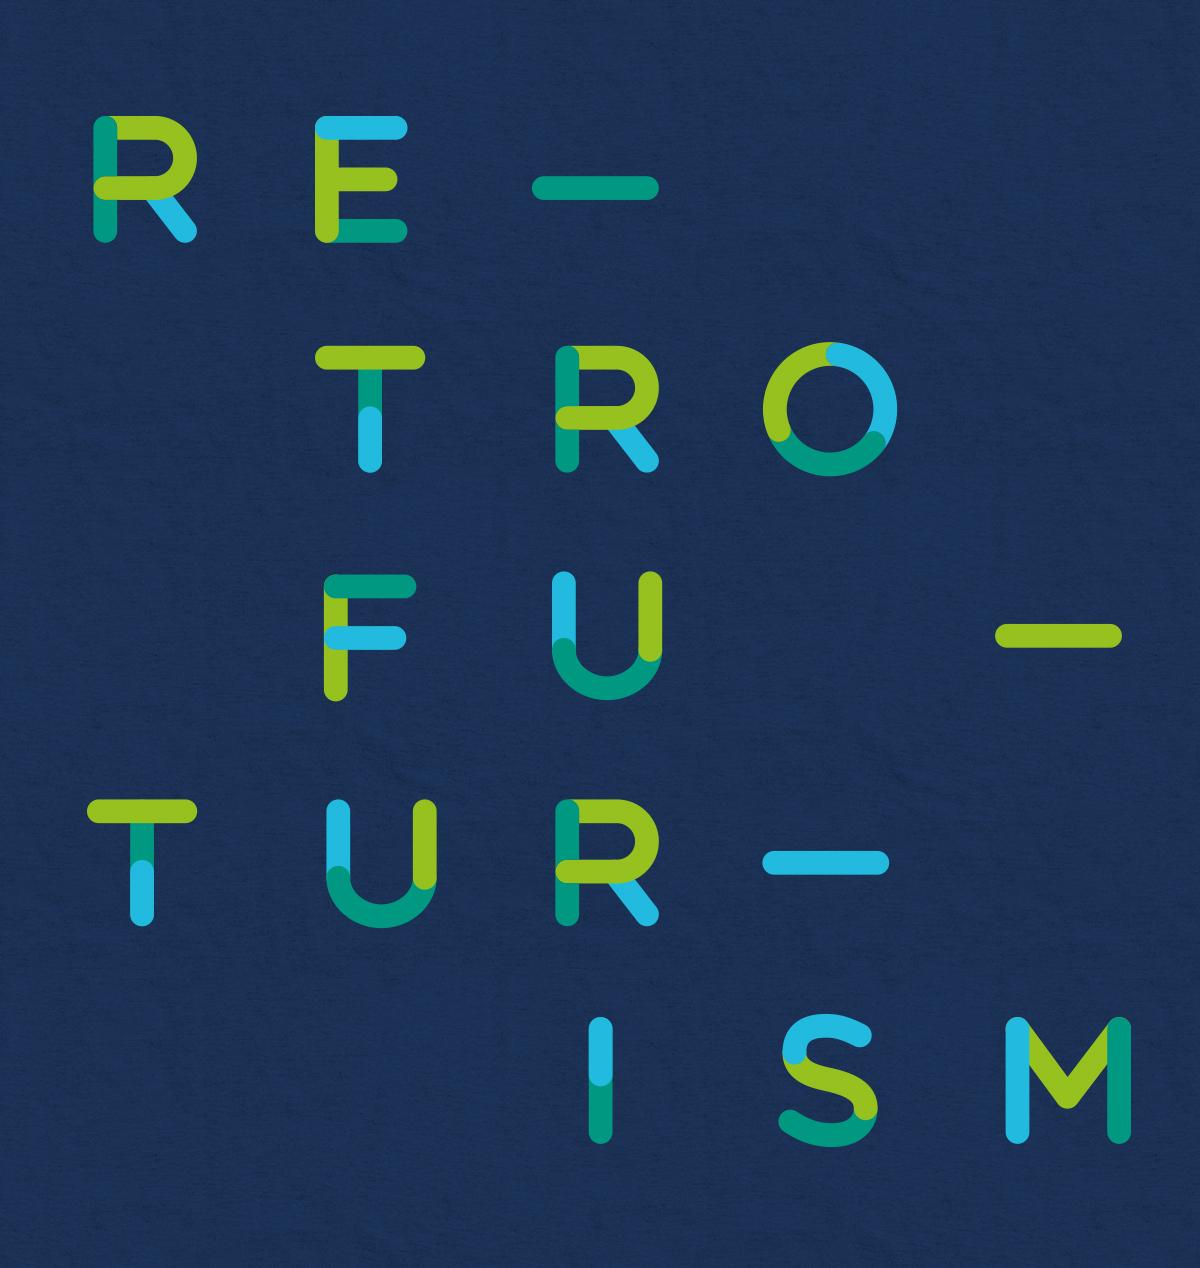 retrofuturism